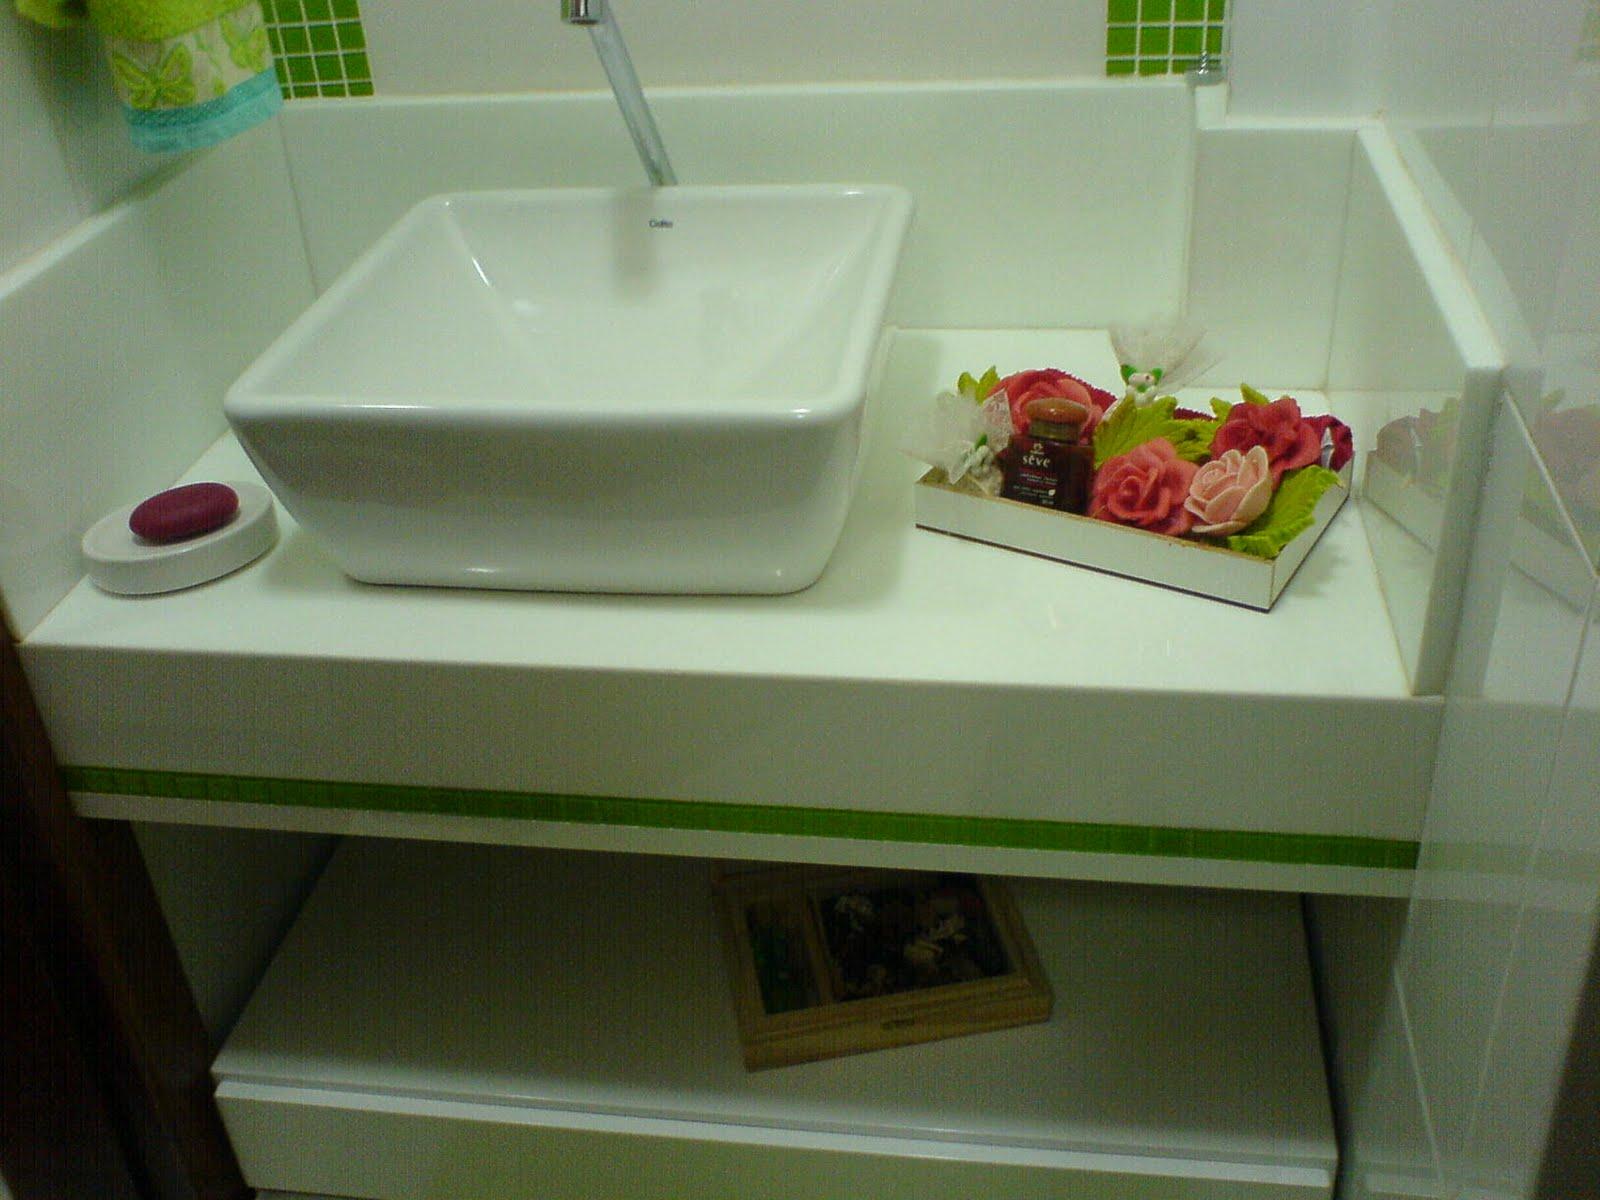 Ângulo Mármores e Granitos: Banheiros #832F26 1600x1200 Bancada Banheiro Cuba Redonda